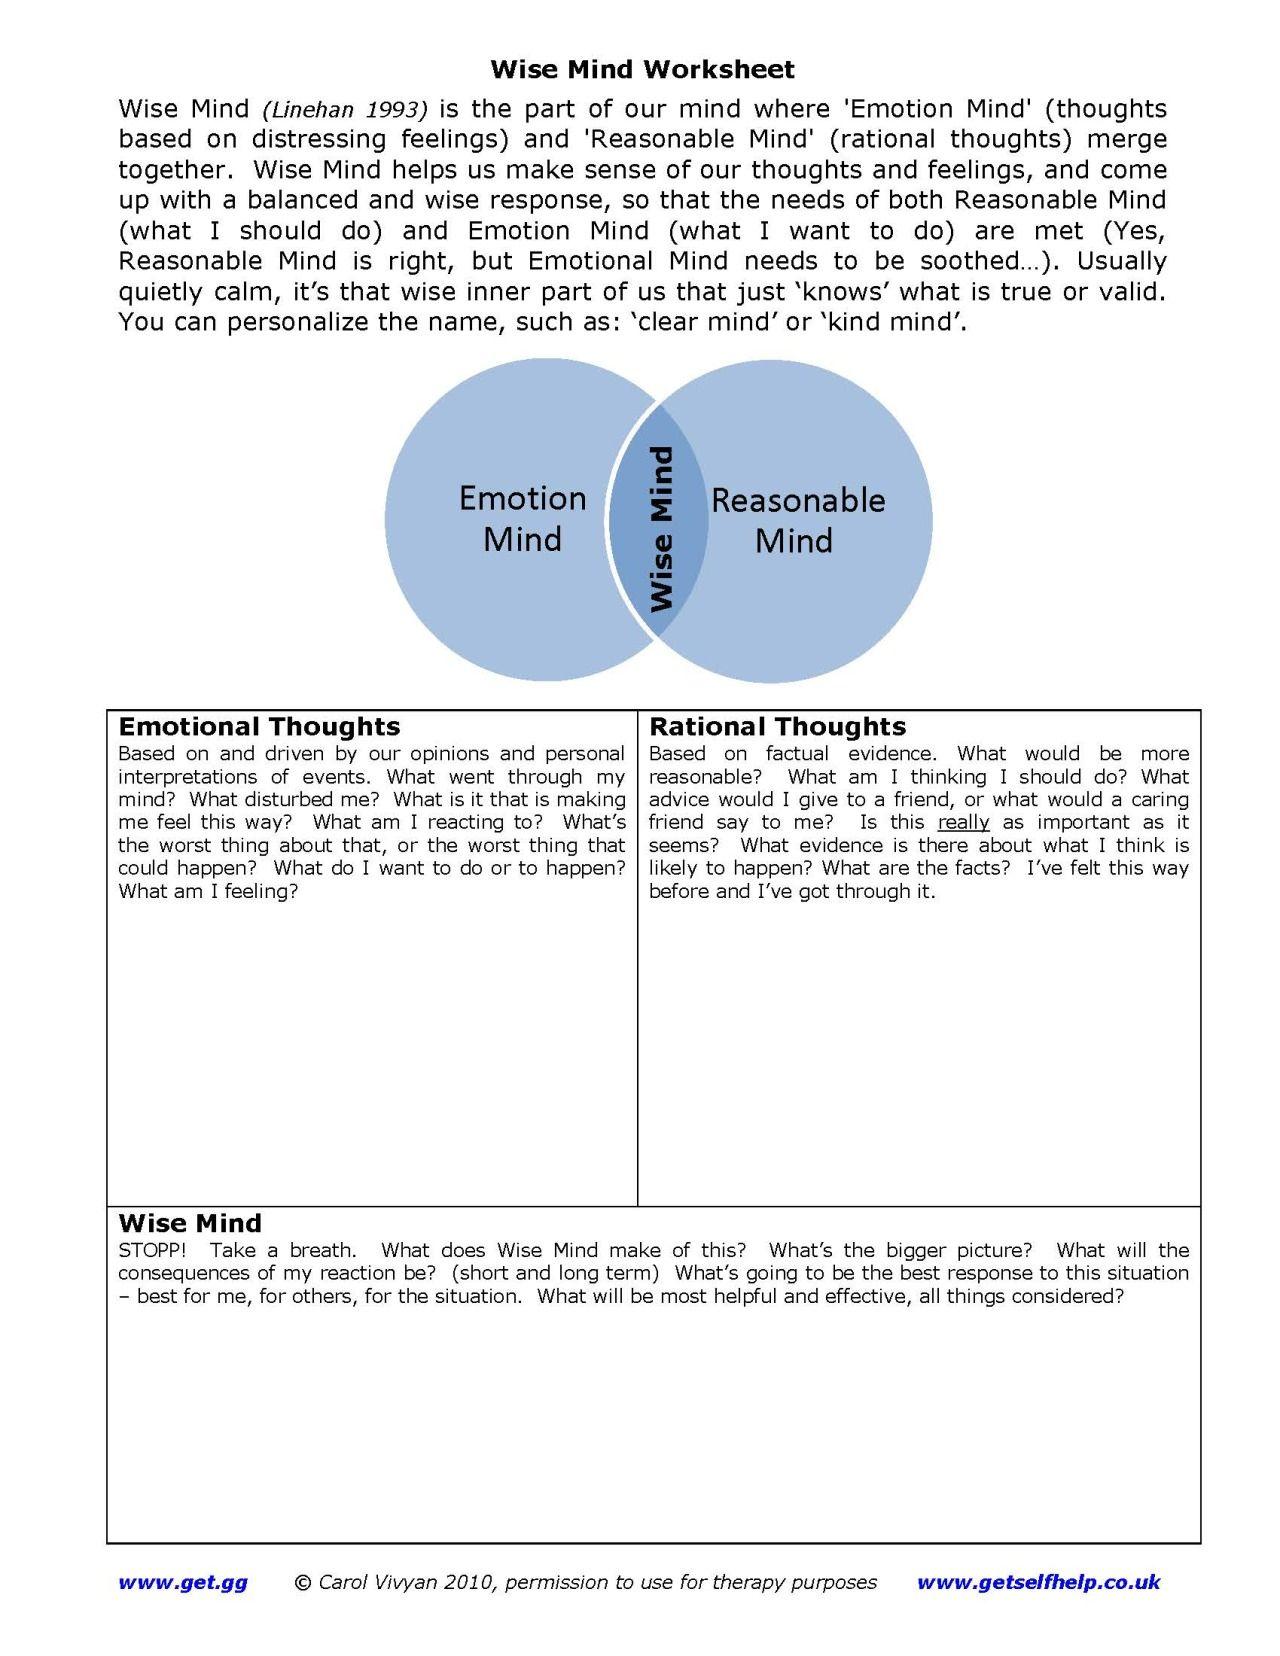 Worksheets Wise Mind Worksheet healingschemas dbt self help resources diary wise mind one